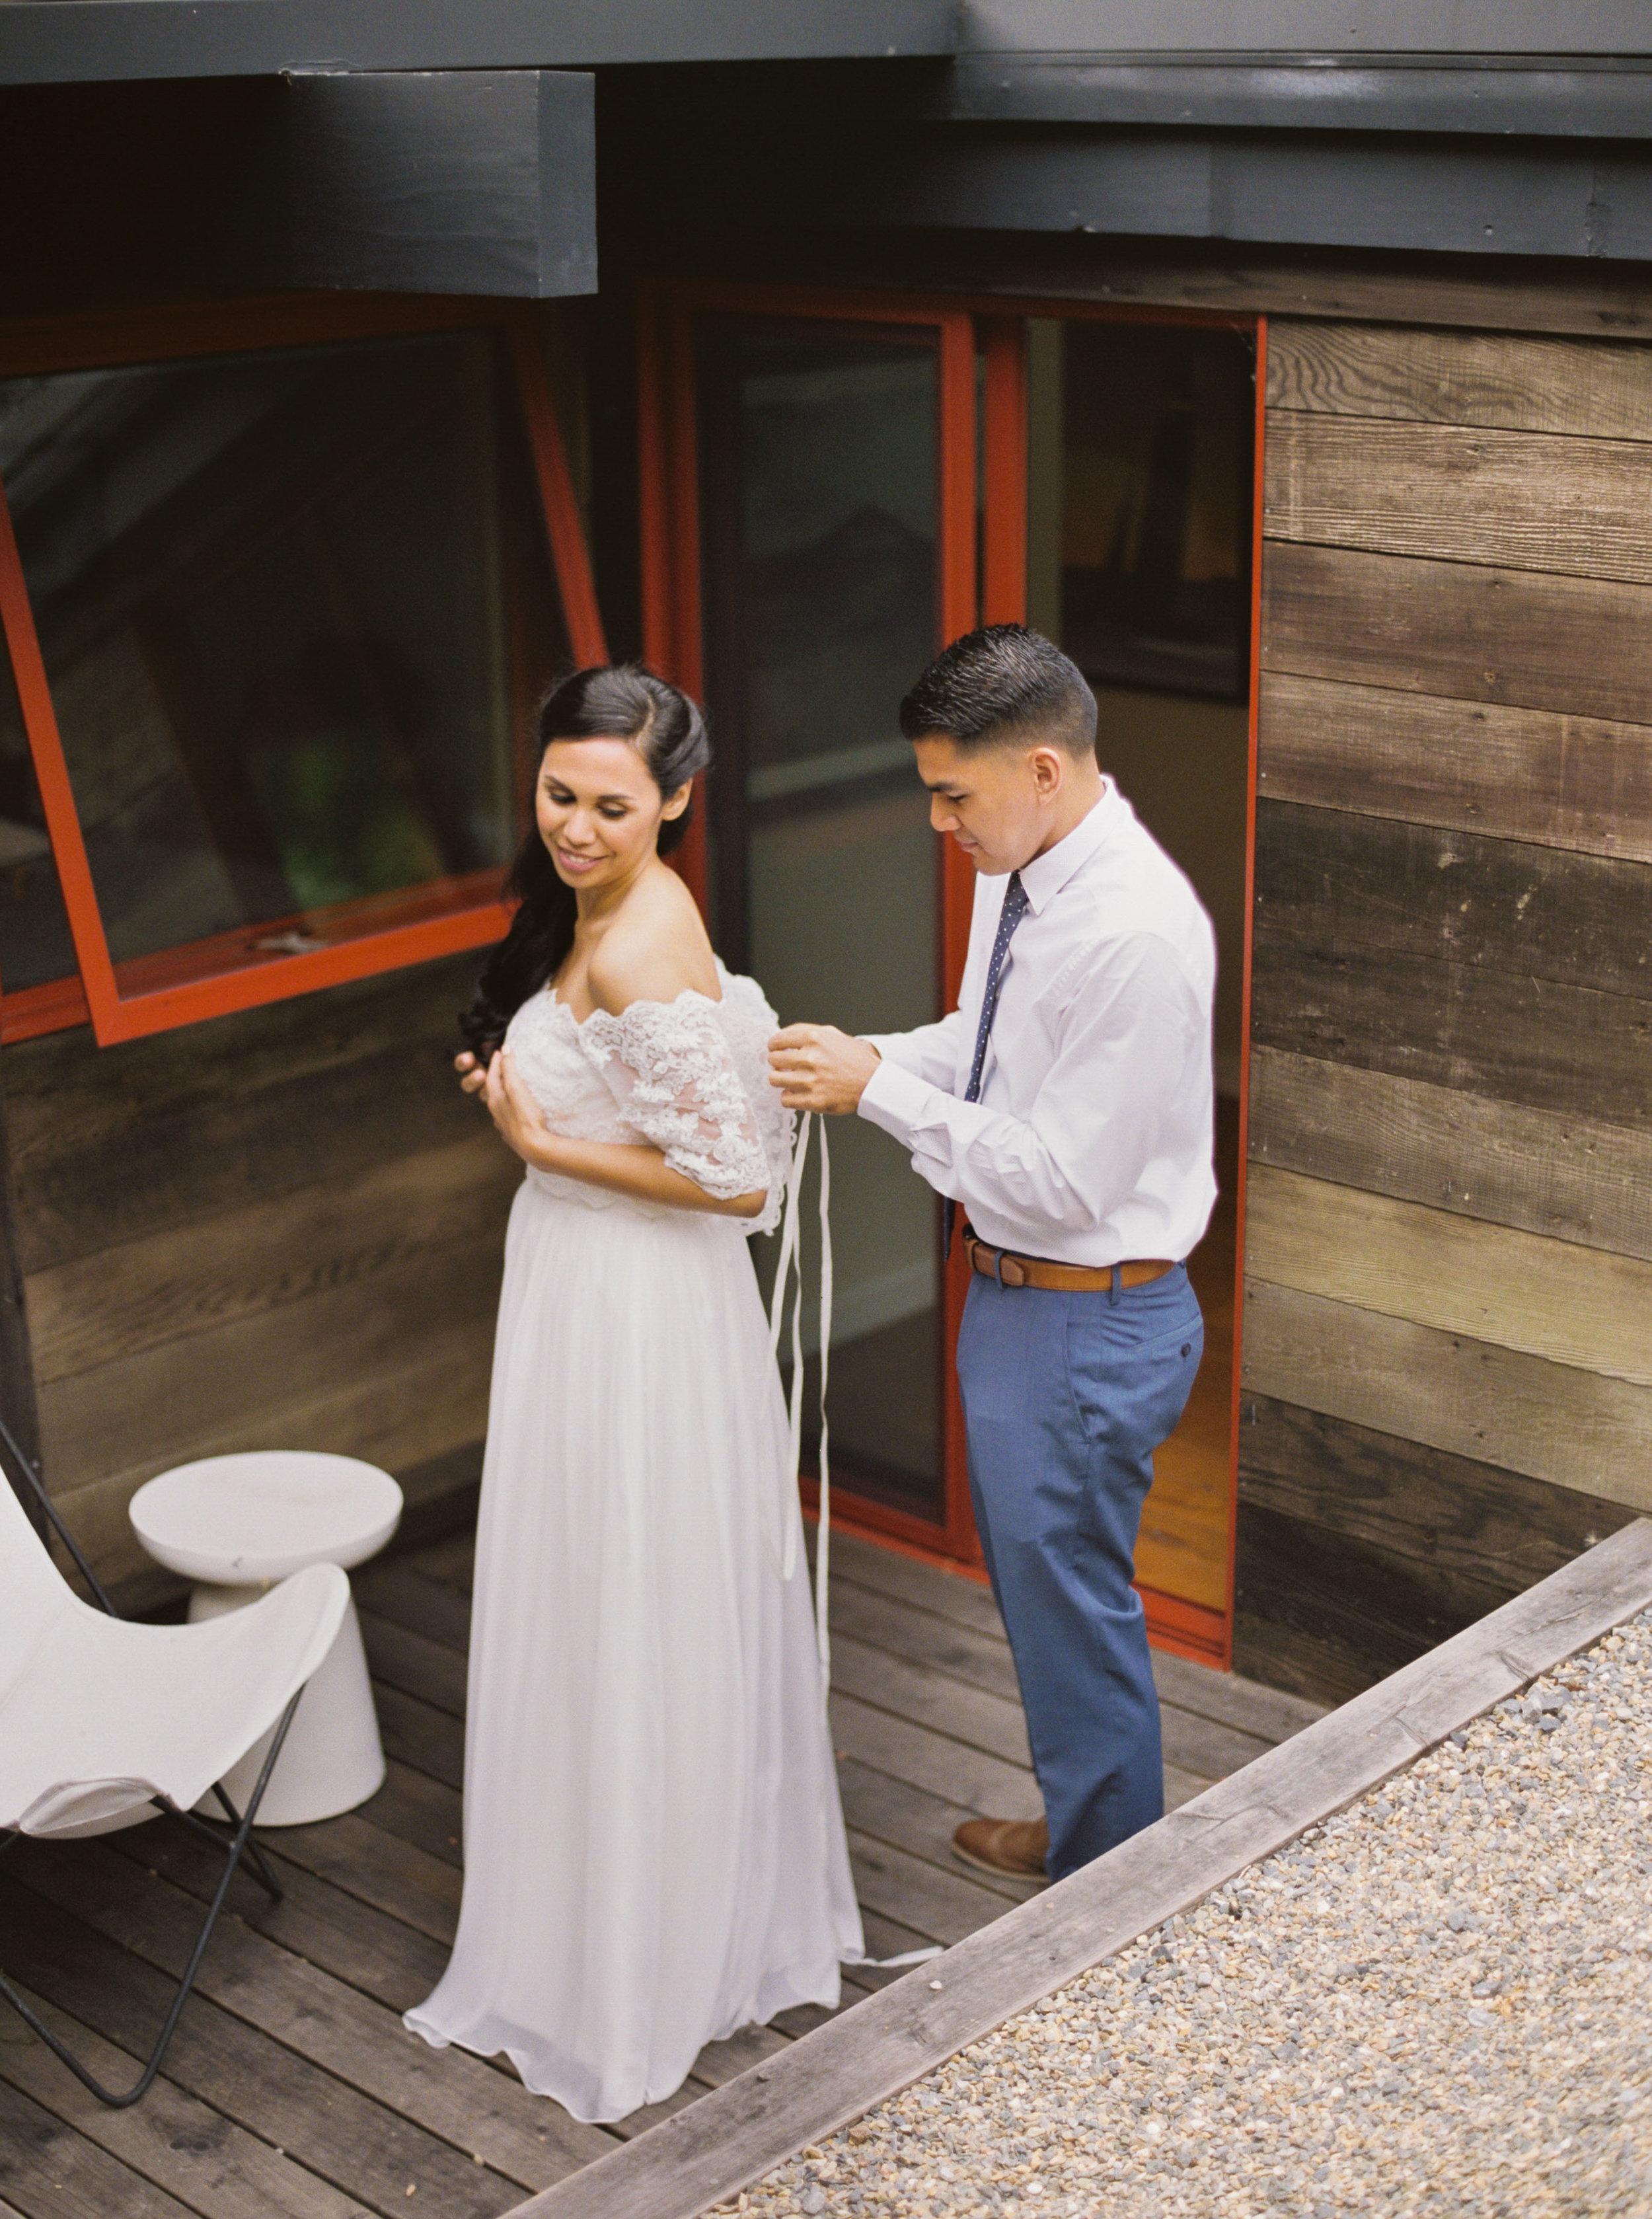 019_Krysten-Crebin-Bay-Area-Elopement-Wedding-Photographer-Videographer.jpg